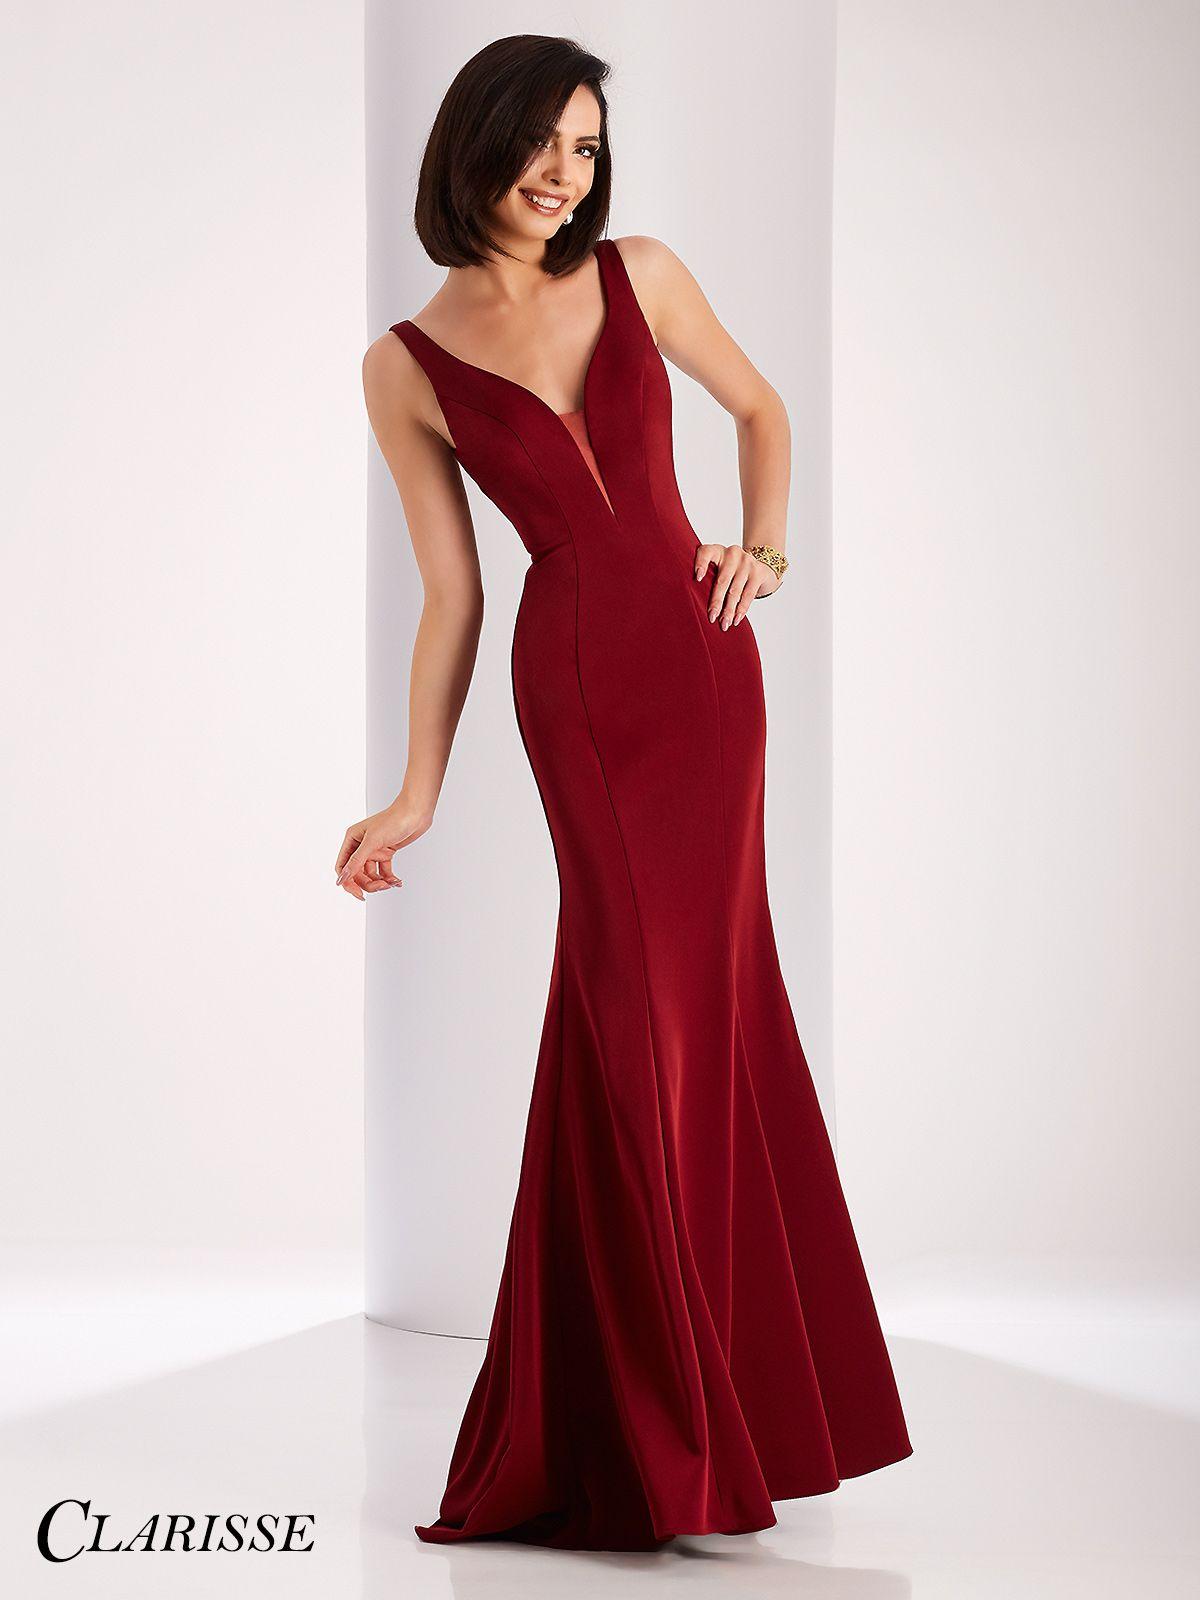 Clarisse elegant vneck satin prom dress red prom dresses